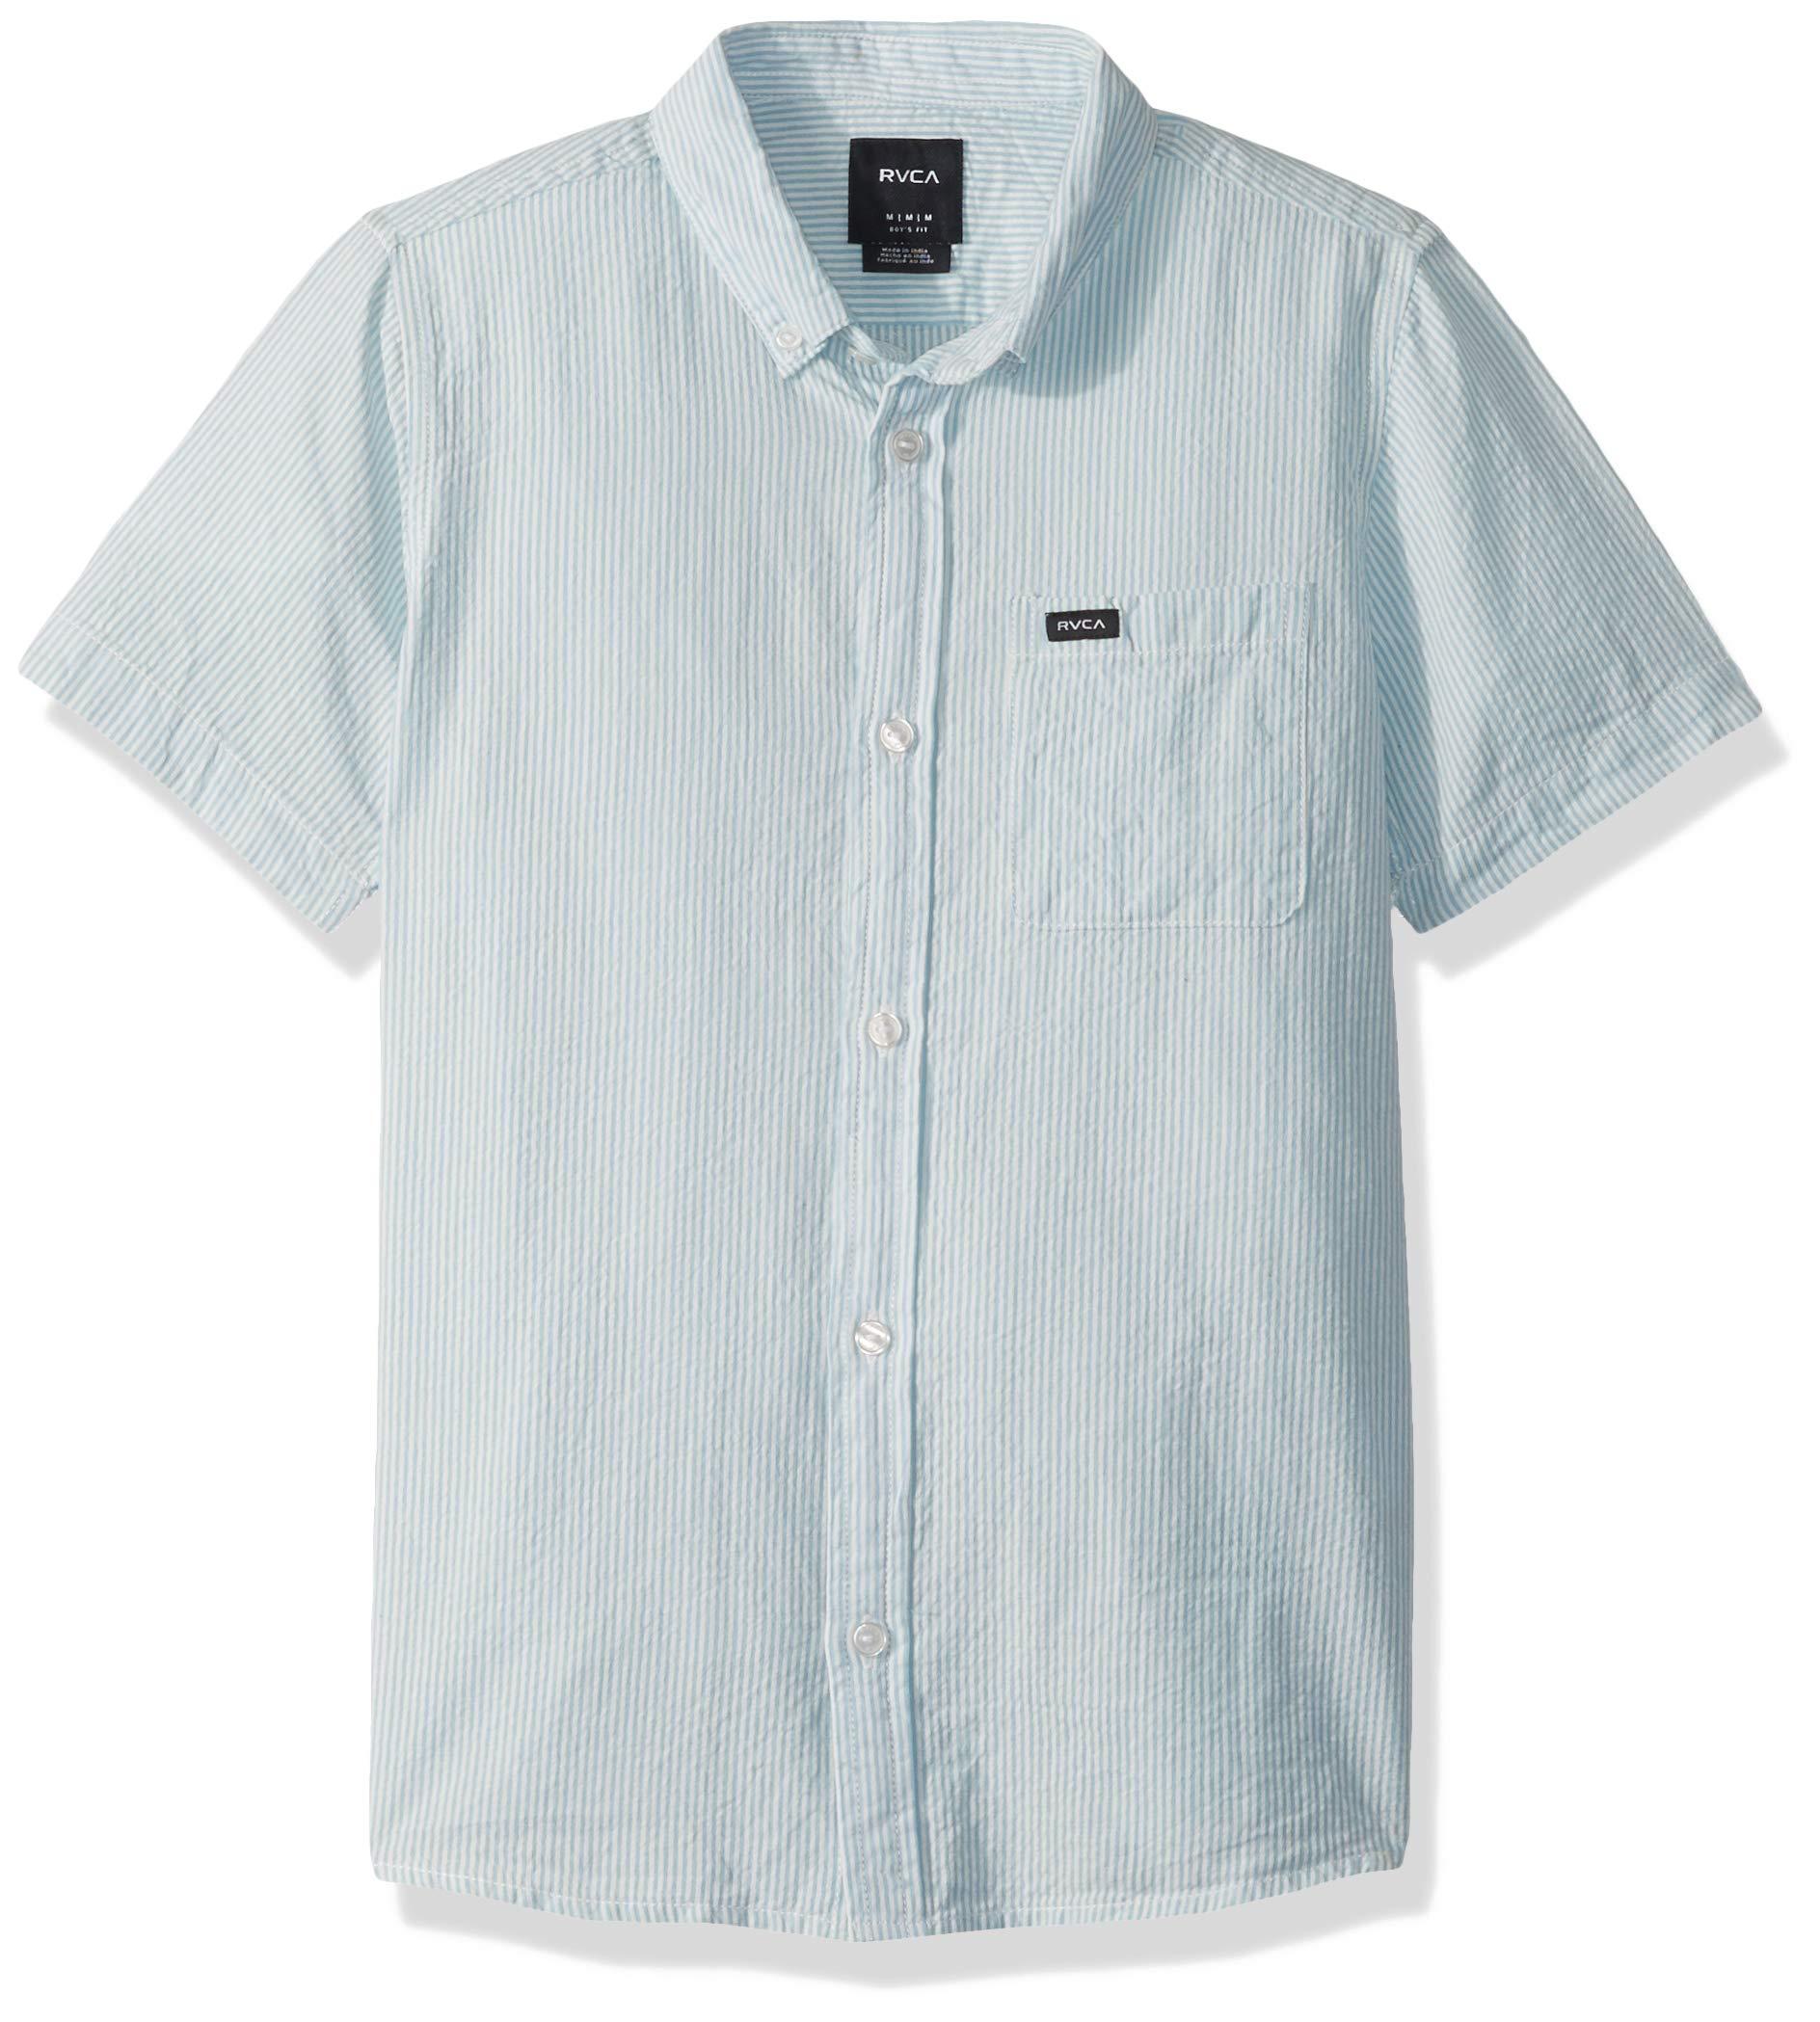 RVCA Boys' Big Thatll DO HI Grade Short Sleeve Woven Button UP Shirt, Sky Blue, XL